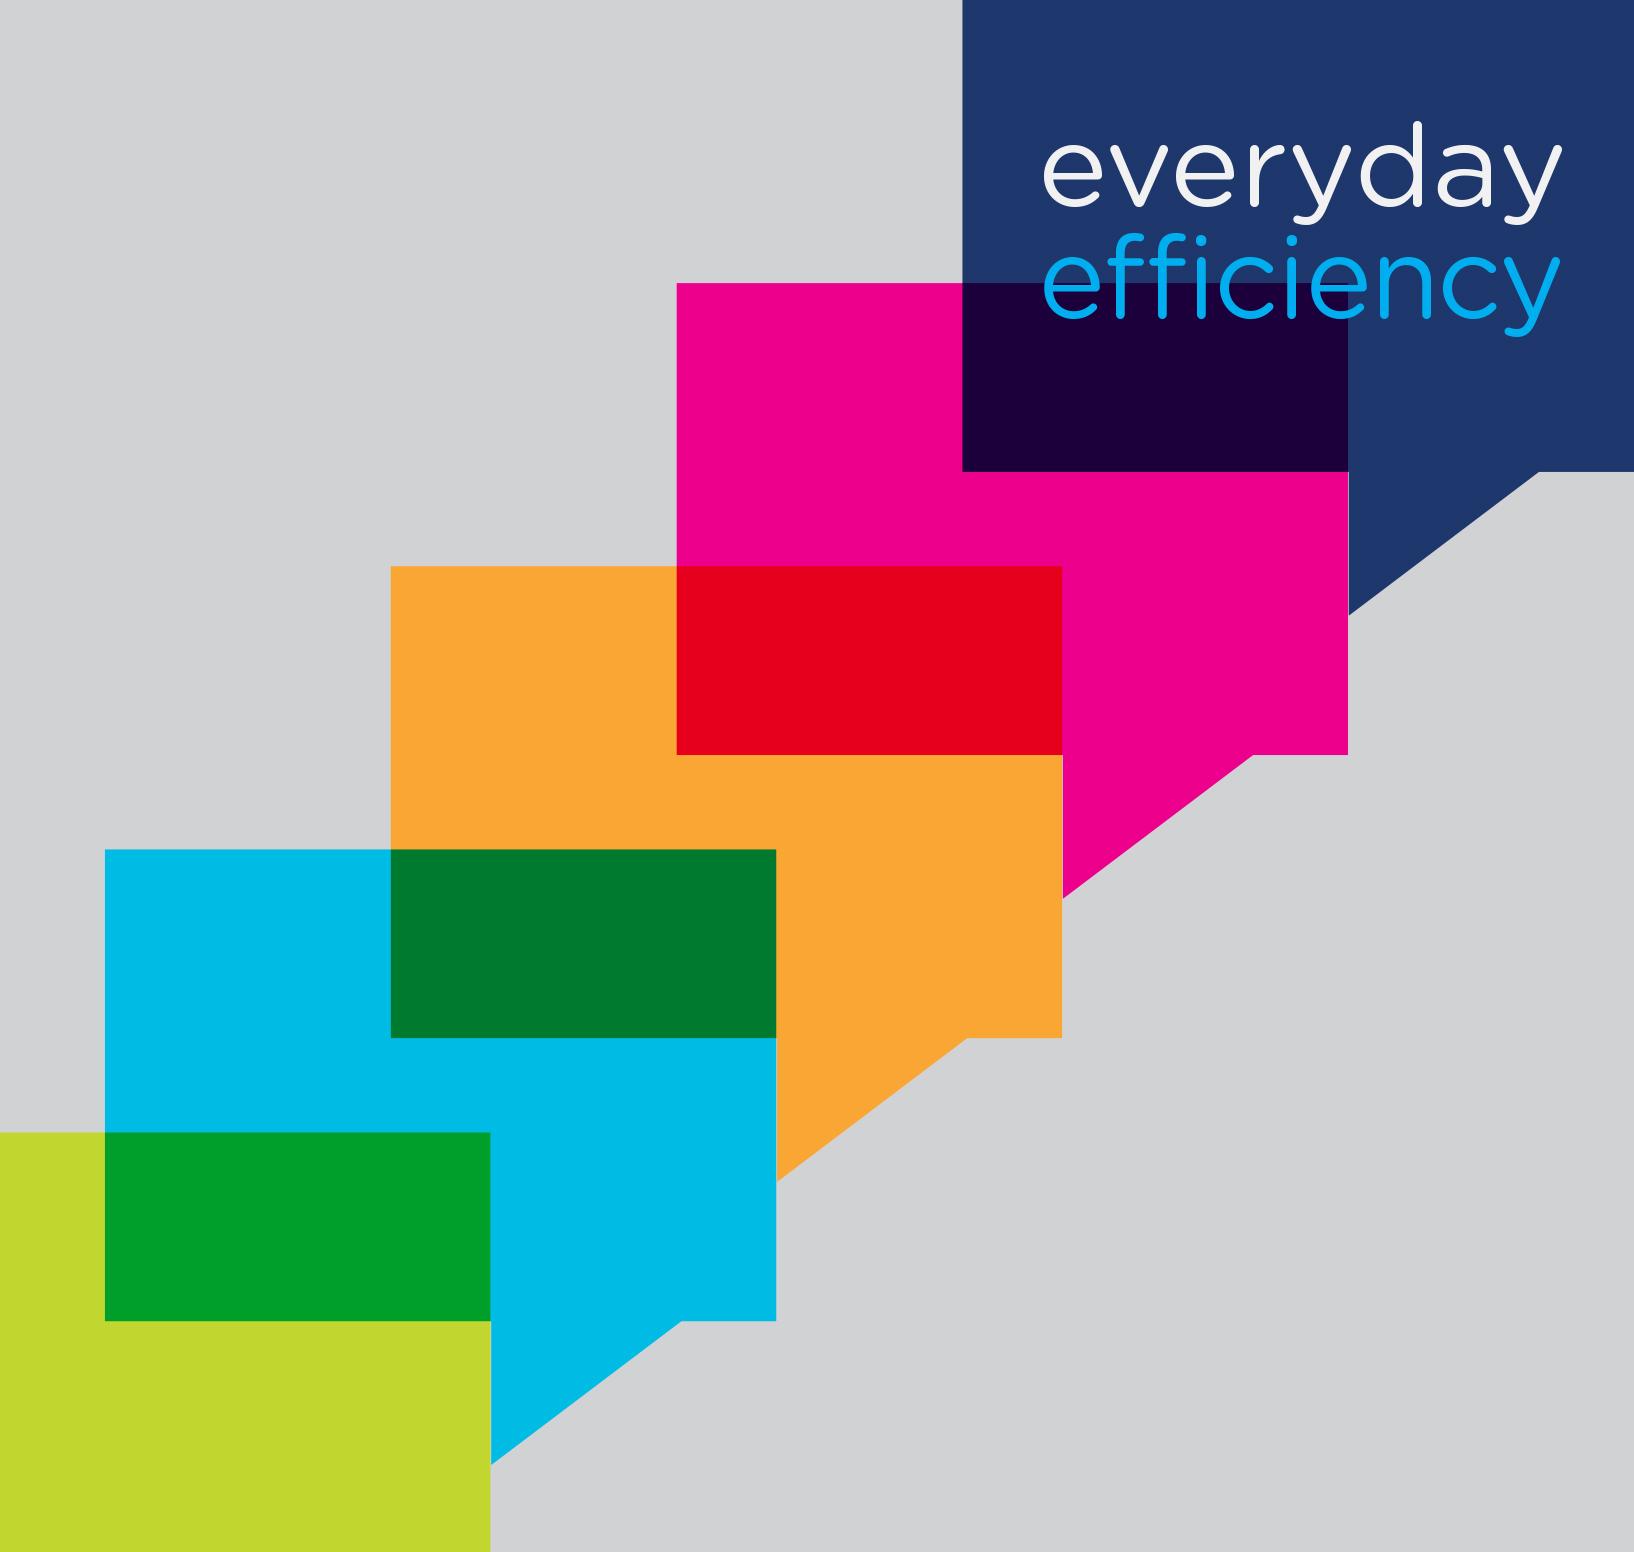 Efficiency_Development-2.jpg